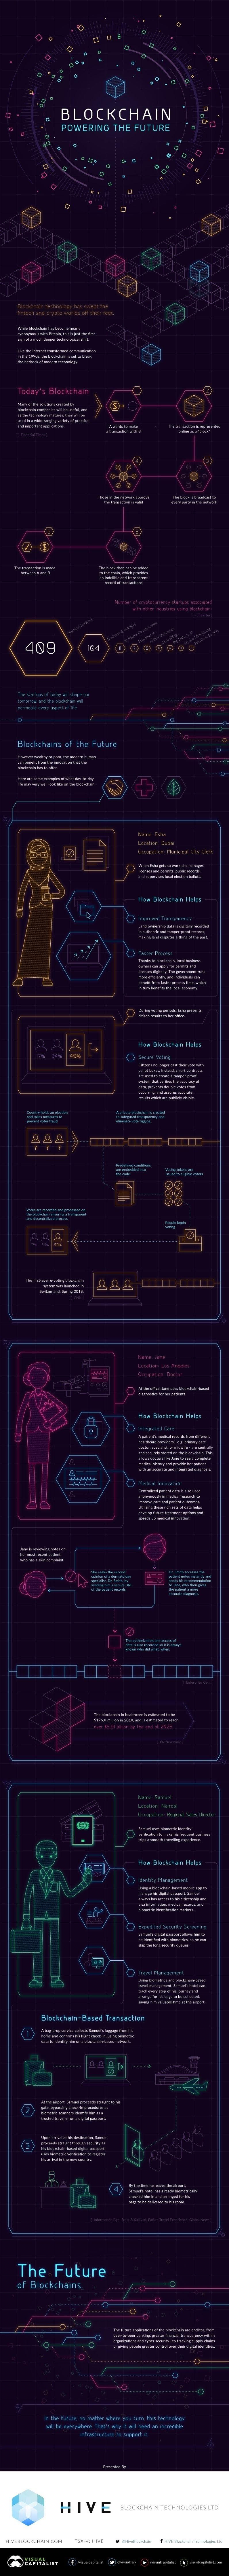 Blockchain: Powering The Future